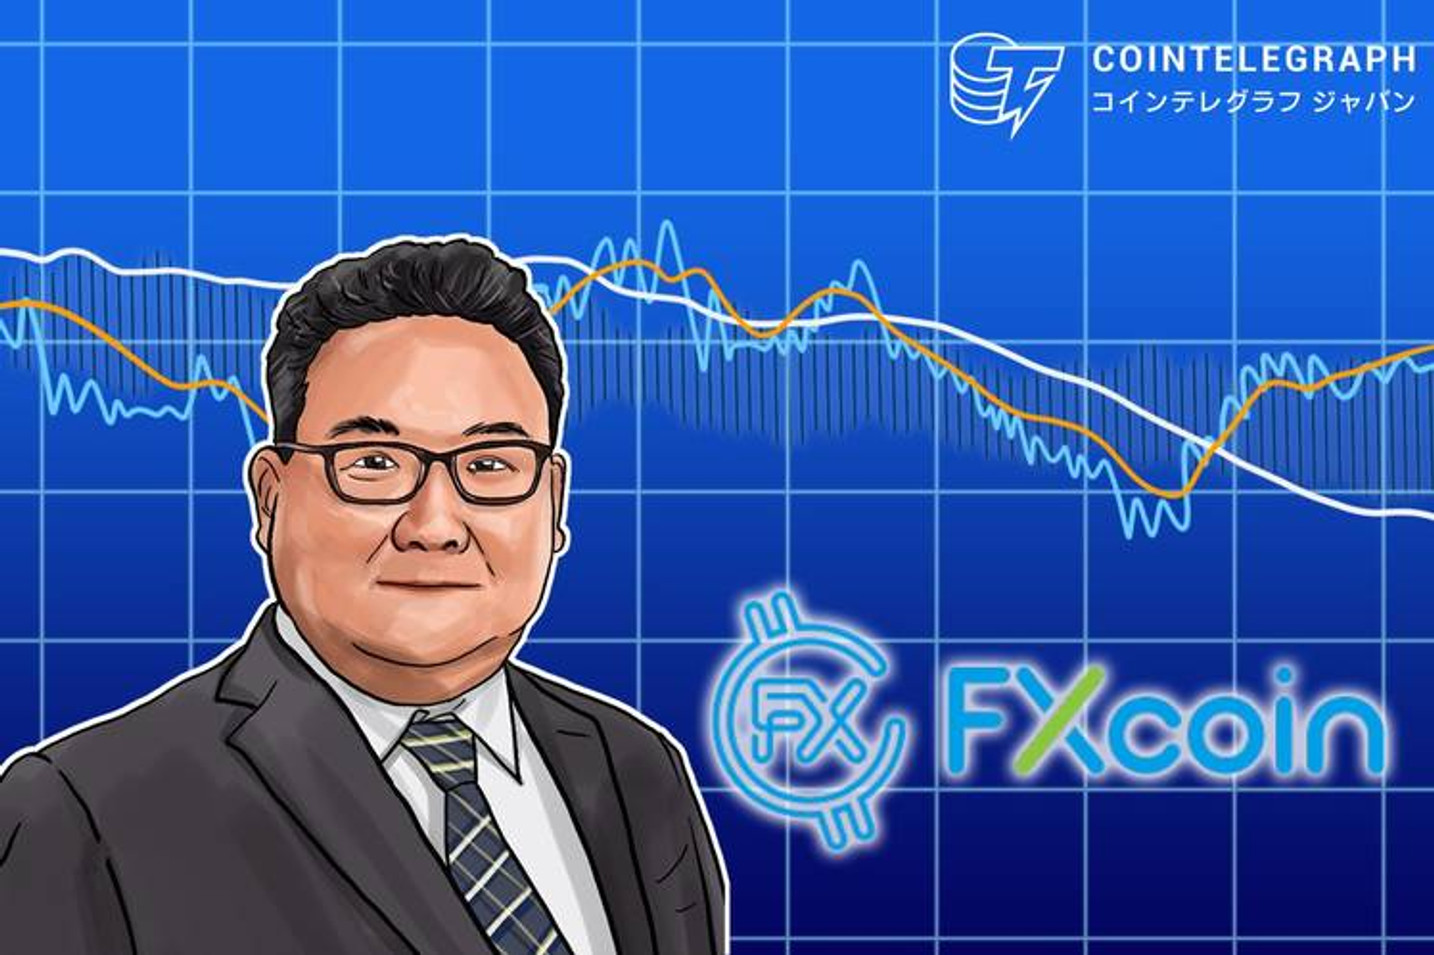 OKexショック後のビットコインが底堅かった理由と意義【仮想通貨相場】